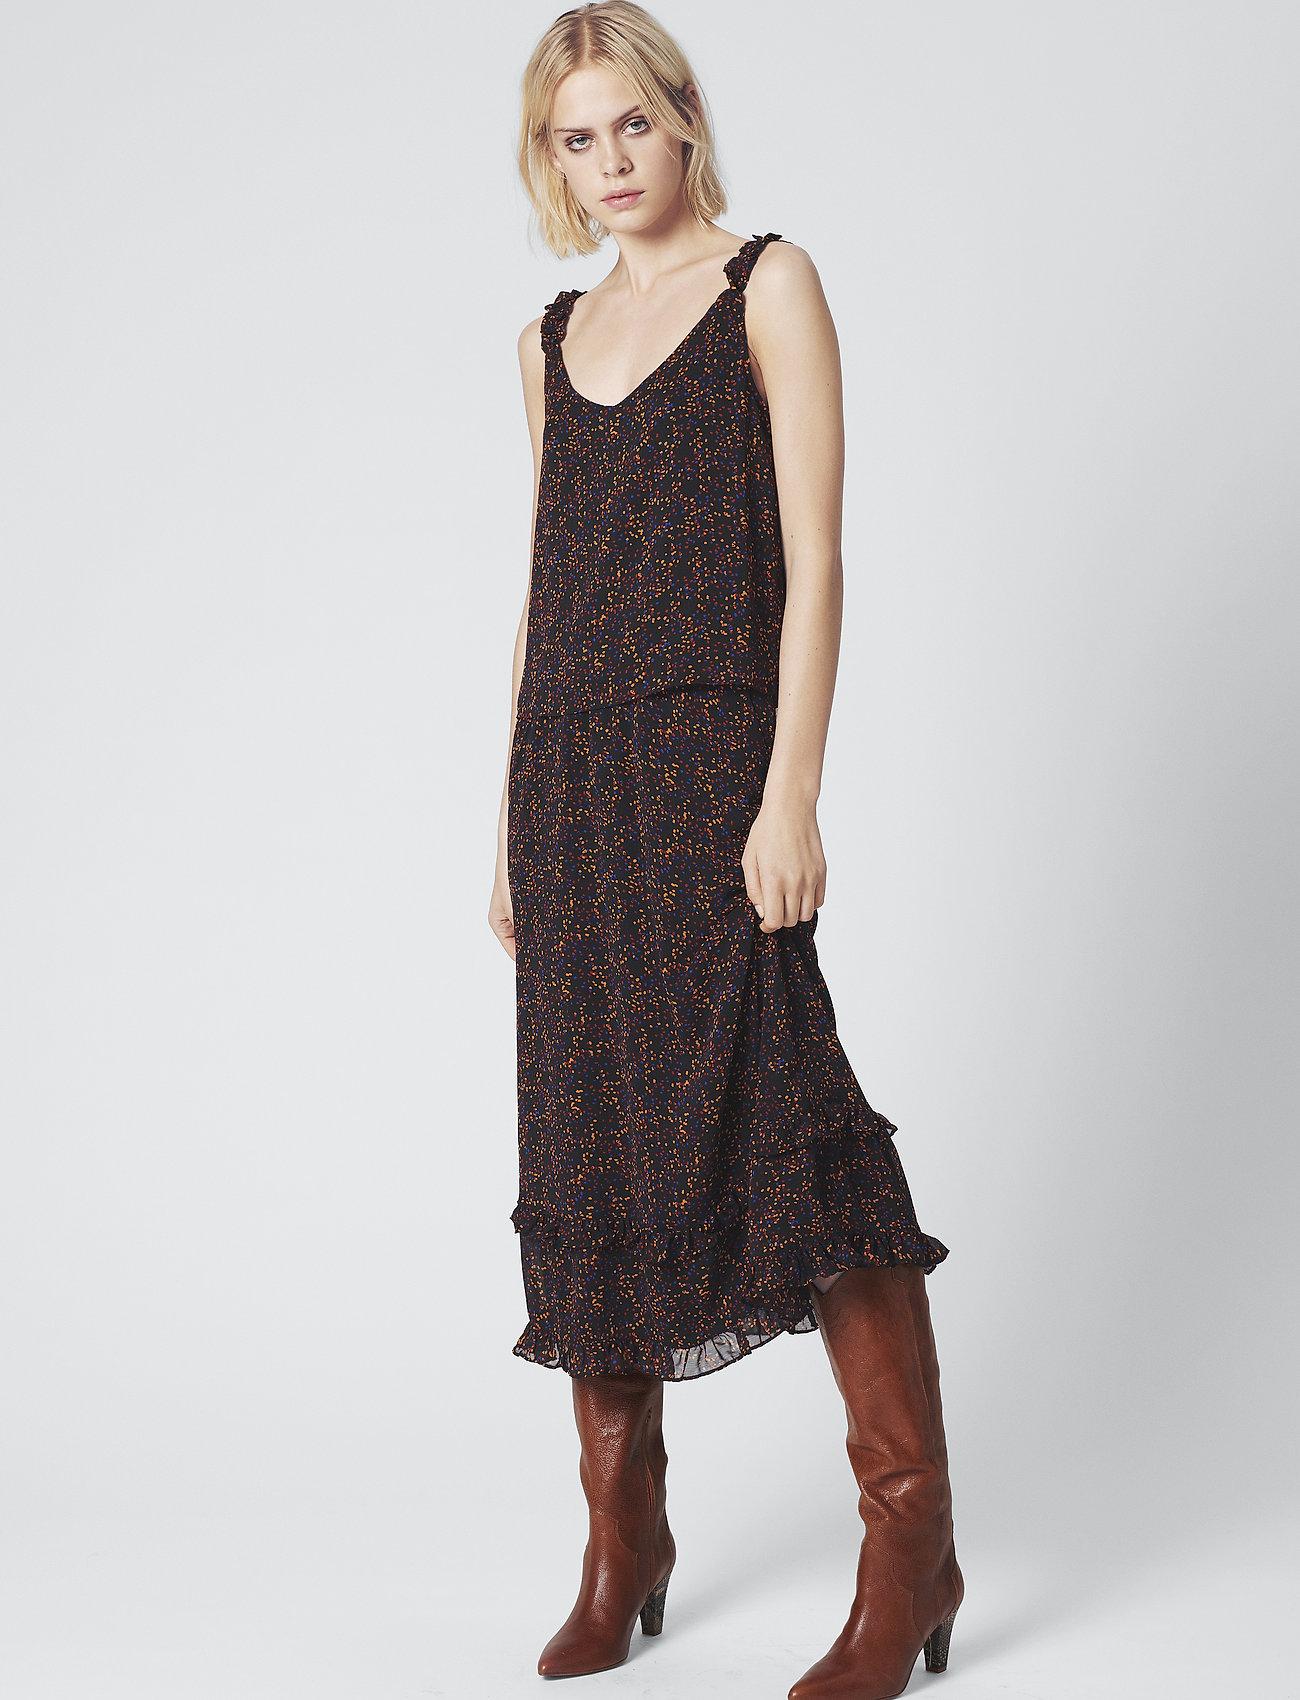 Skirt Ma19black Skirt Ma19black Alminagz Multi Alminagz DotGestuz jL54RA